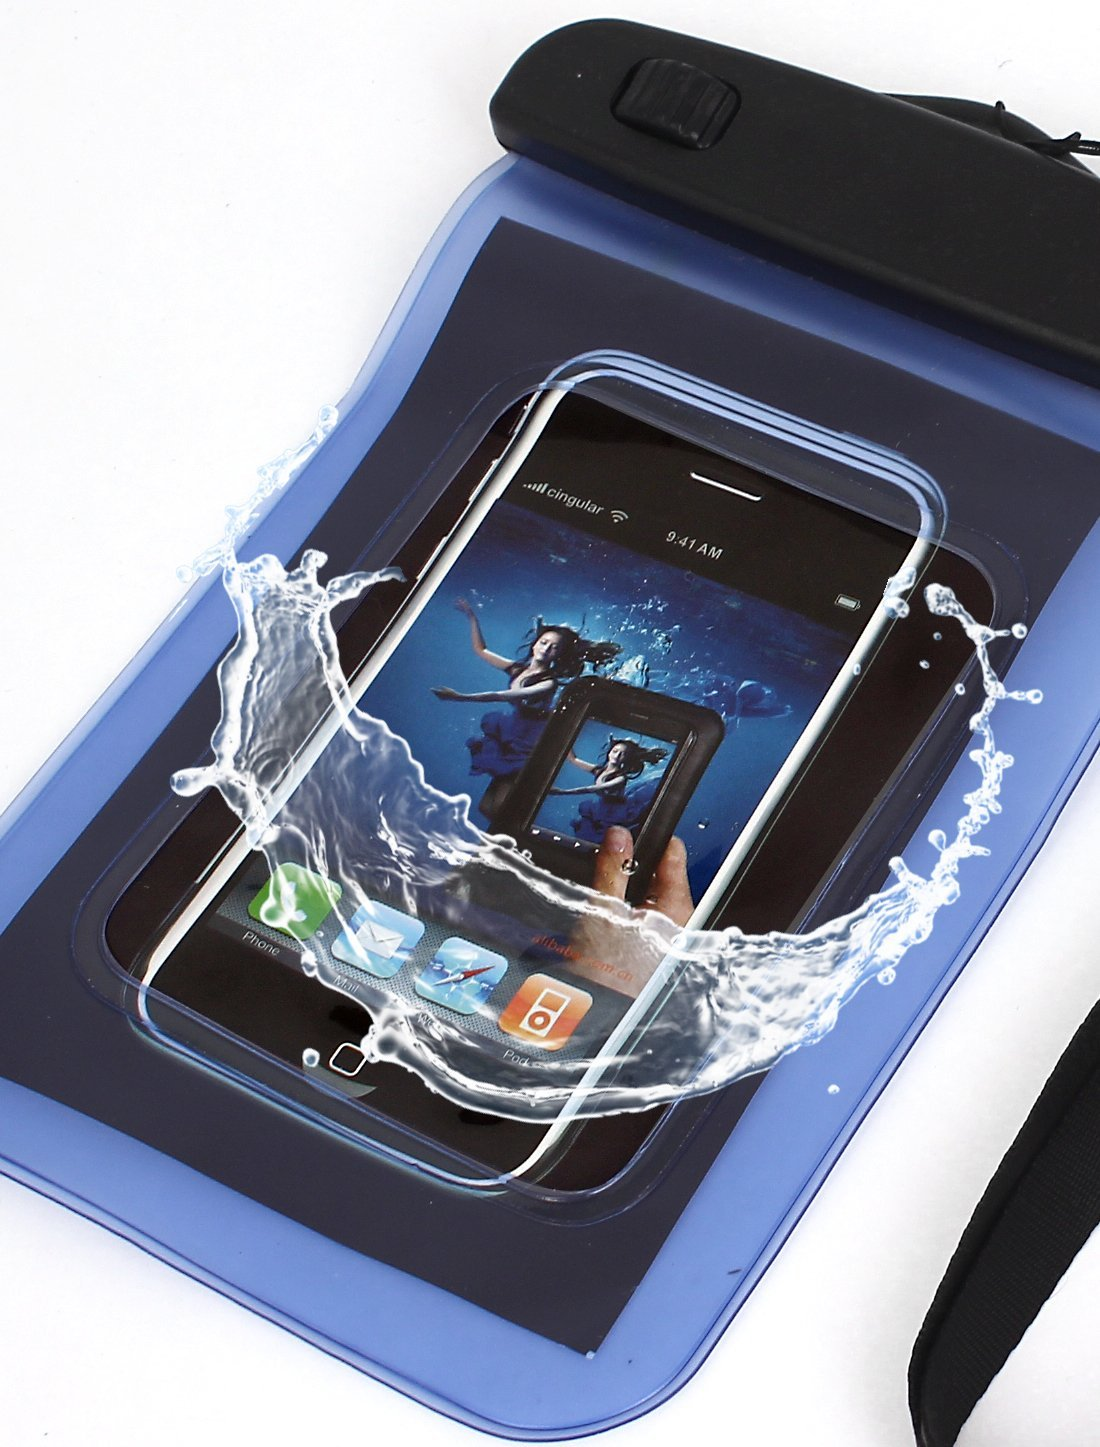 Amazon.com : eDealMax Caso impermeable del teléfono móvil del bolso seco del Protector de la Bolsa Azul + Correa : Sports & Outdoors